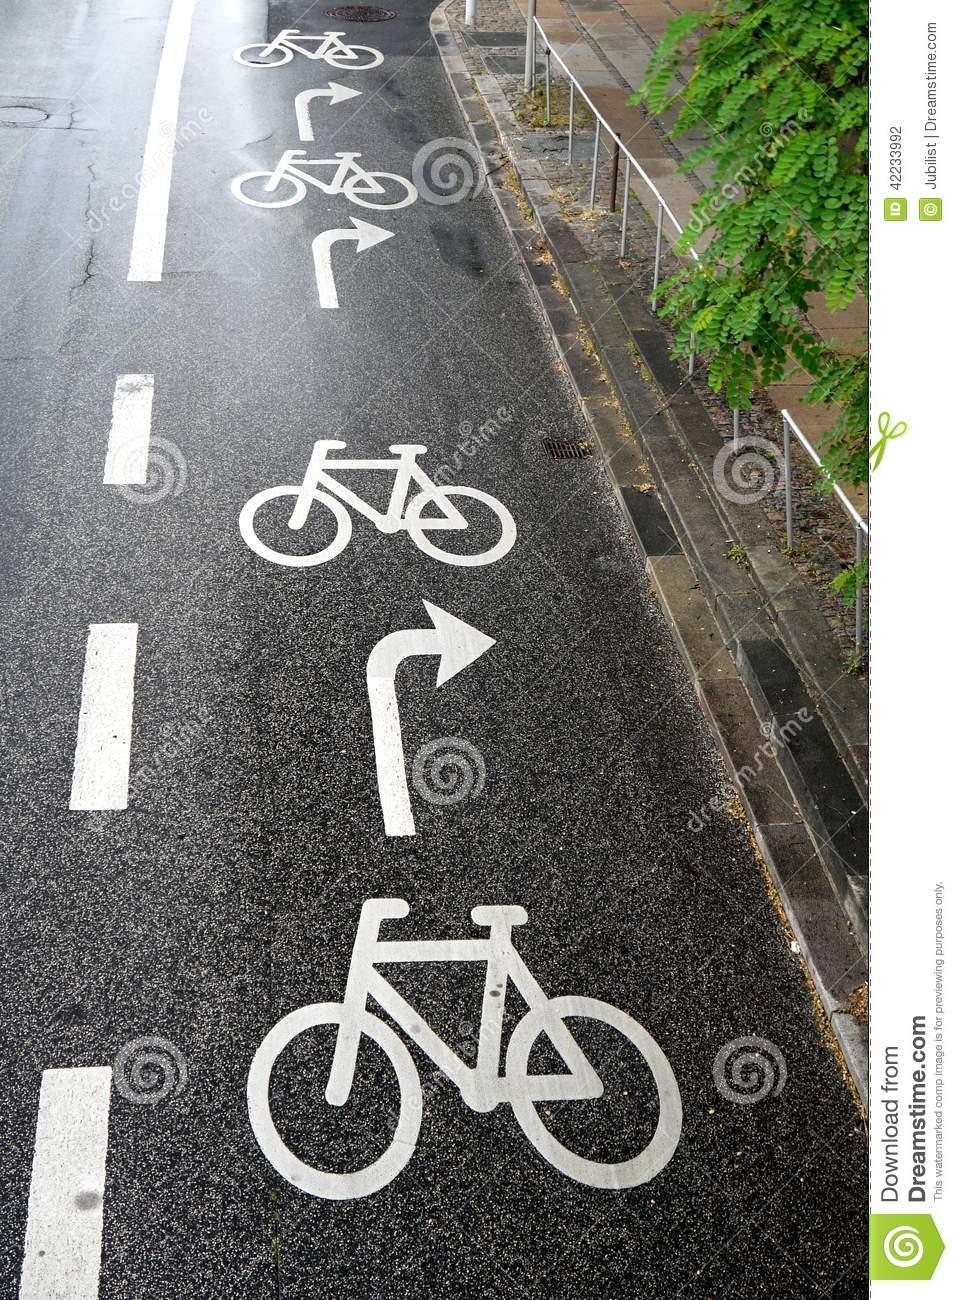 Cycling: Road Markings Bike Lane Stock Photo.